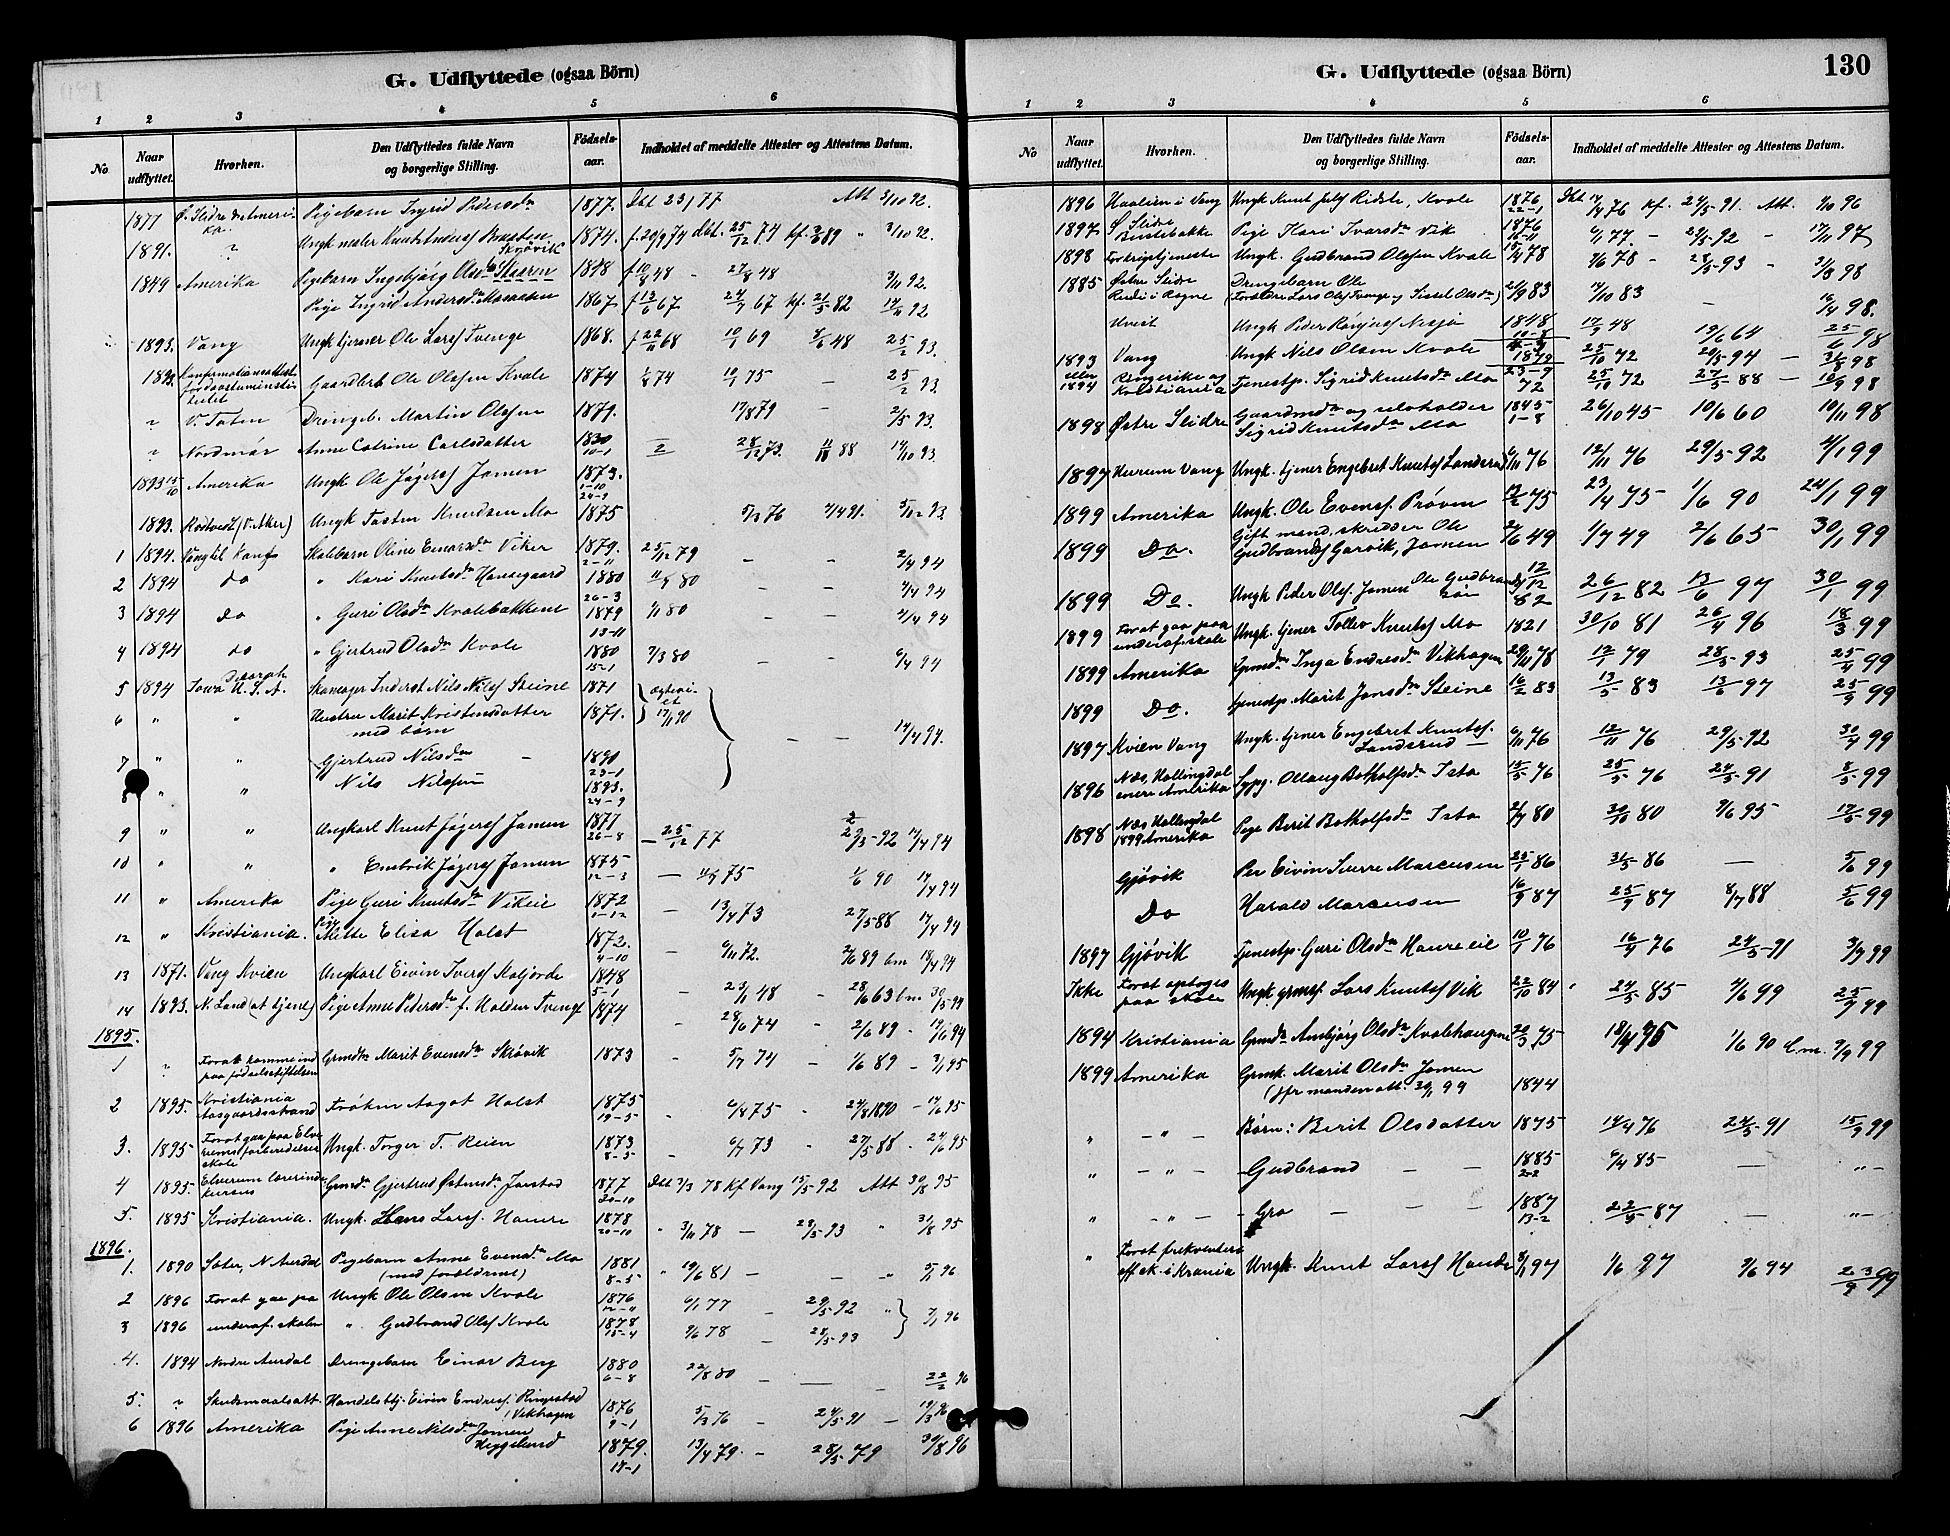 SAH, Vestre Slidre prestekontor, Klokkerbok nr. 4, 1881-1912, s. 130